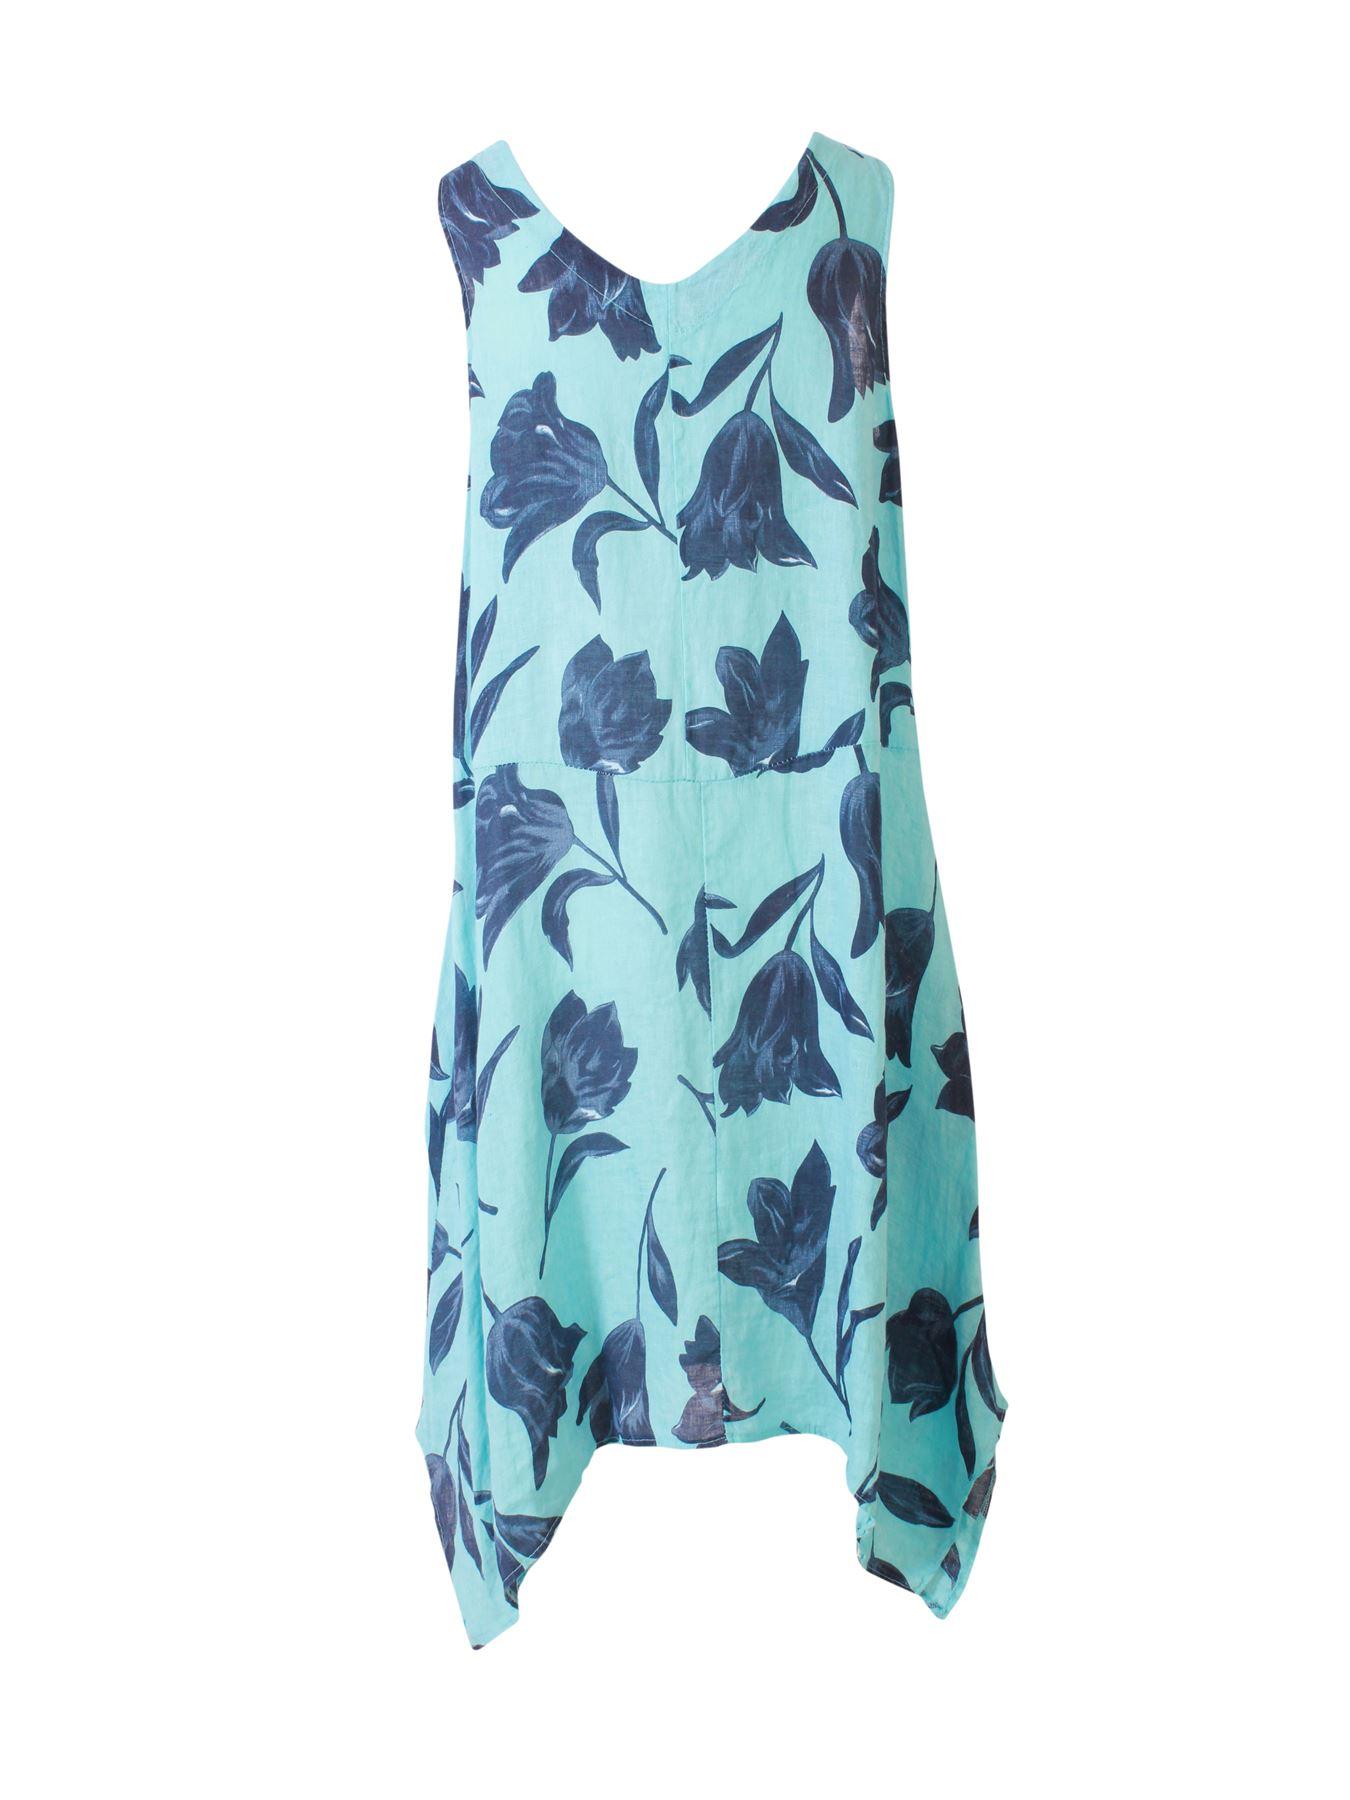 Womens-Tulip-Floral-Print-Italian-Lagenlook-Ladies-Linen-Dress-Two-Button-V-Neck thumbnail 19